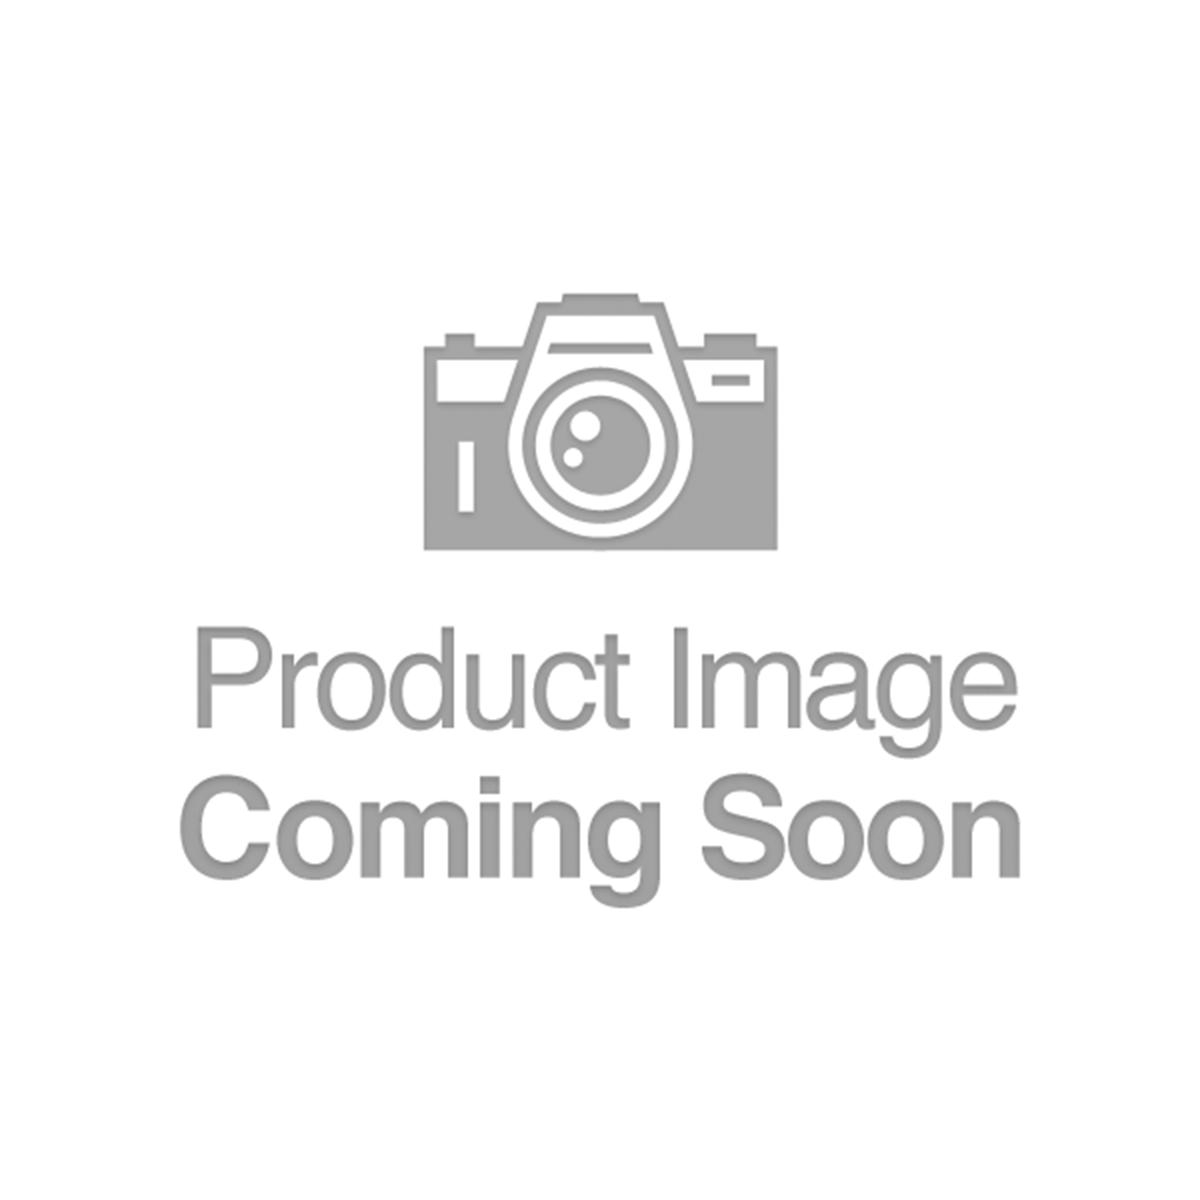 1775 Machin's Mills halfpenny. Vlack 4-75A. Rarity-4. VF Details, Scratch (PCGS).